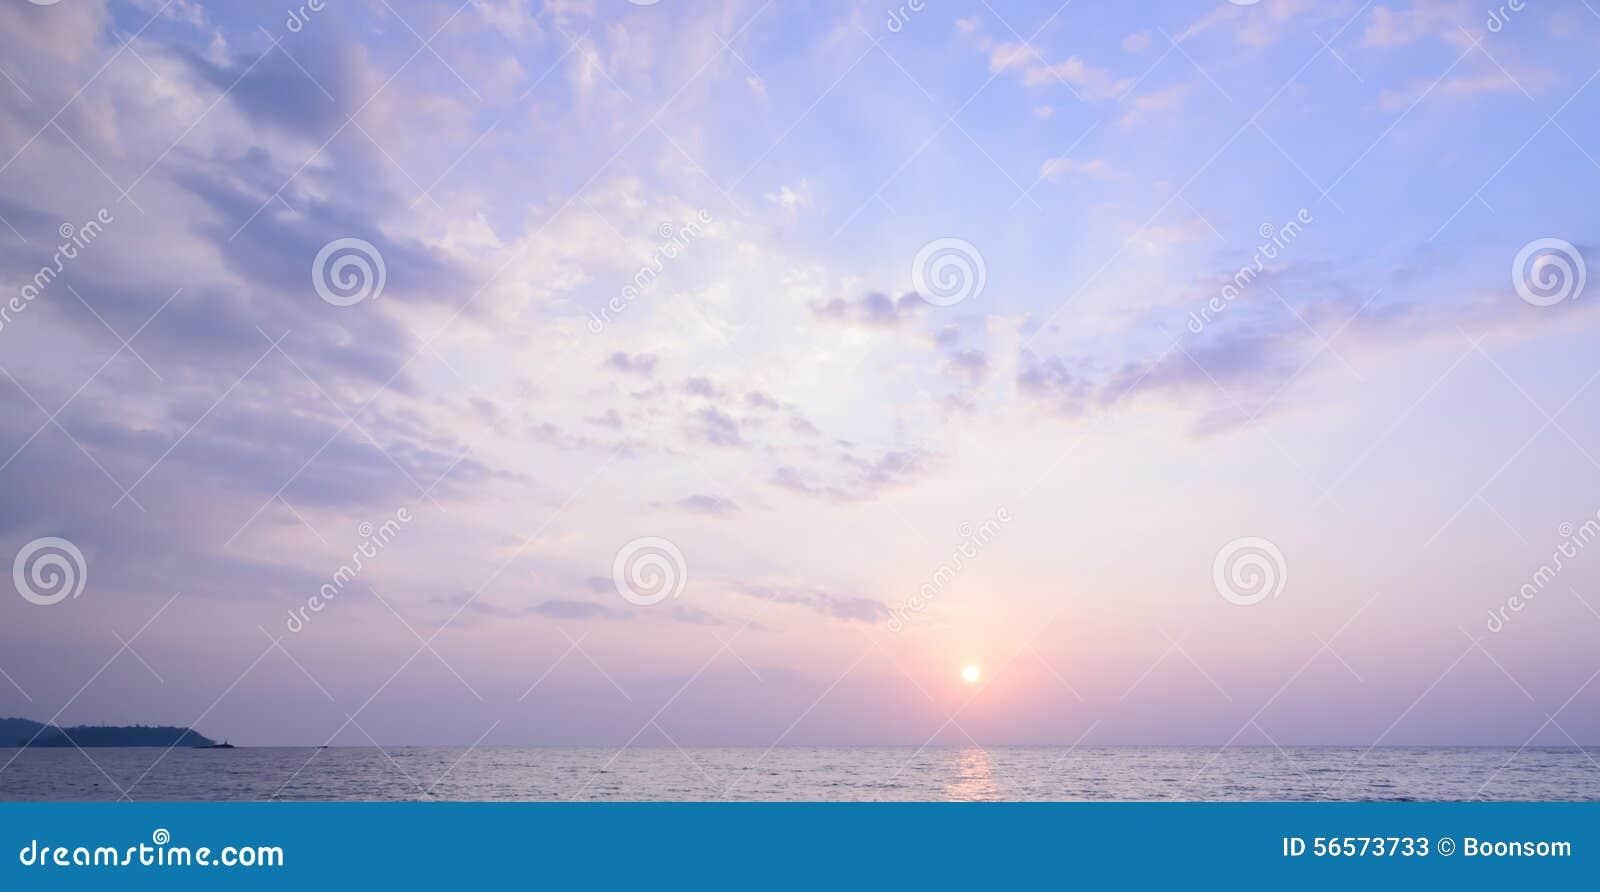 Download Ζωηρόχρωμο Seascape ηλιοβασίλεμα στην Ταϊλάνδη Στοκ Εικόνα - εικόνα από ήλιος, λόφος: 56573733